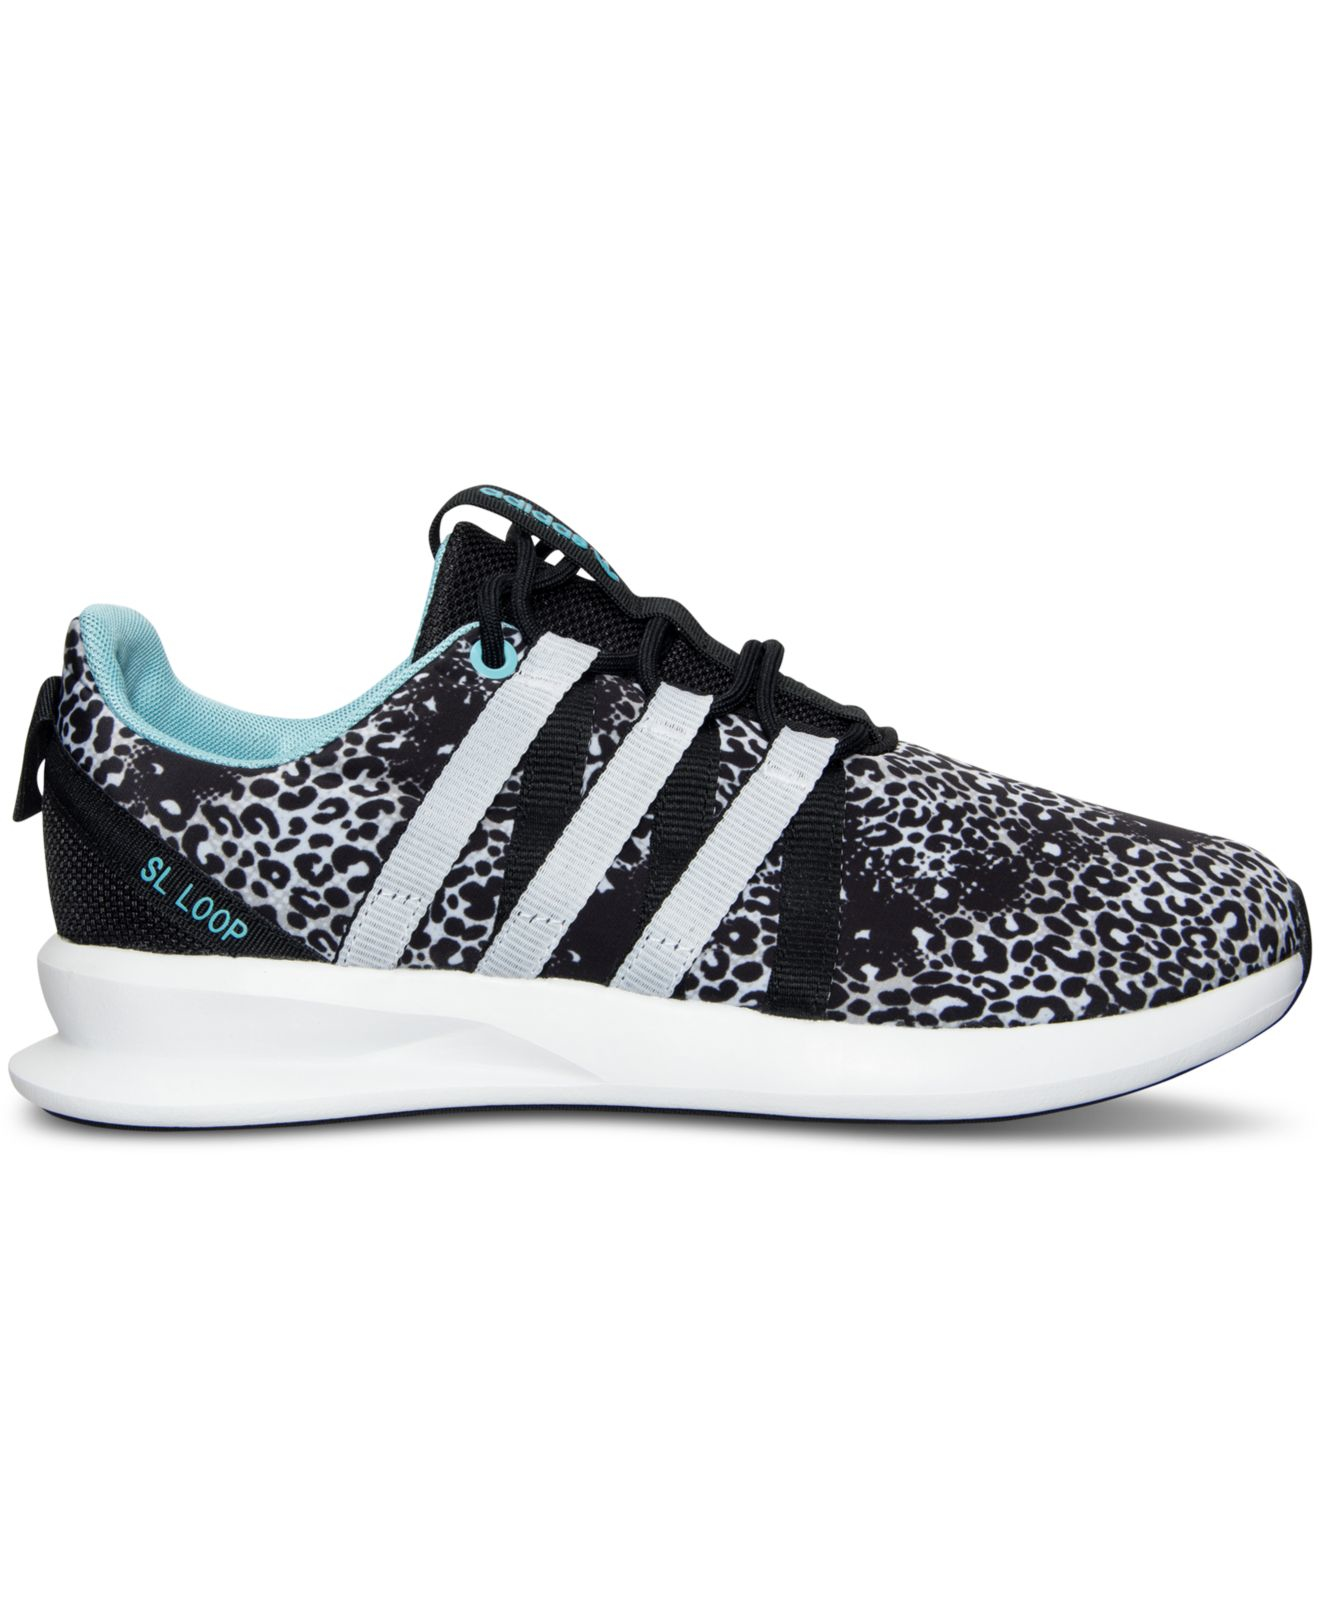 Tj Maxx Women S Athletic Shoes